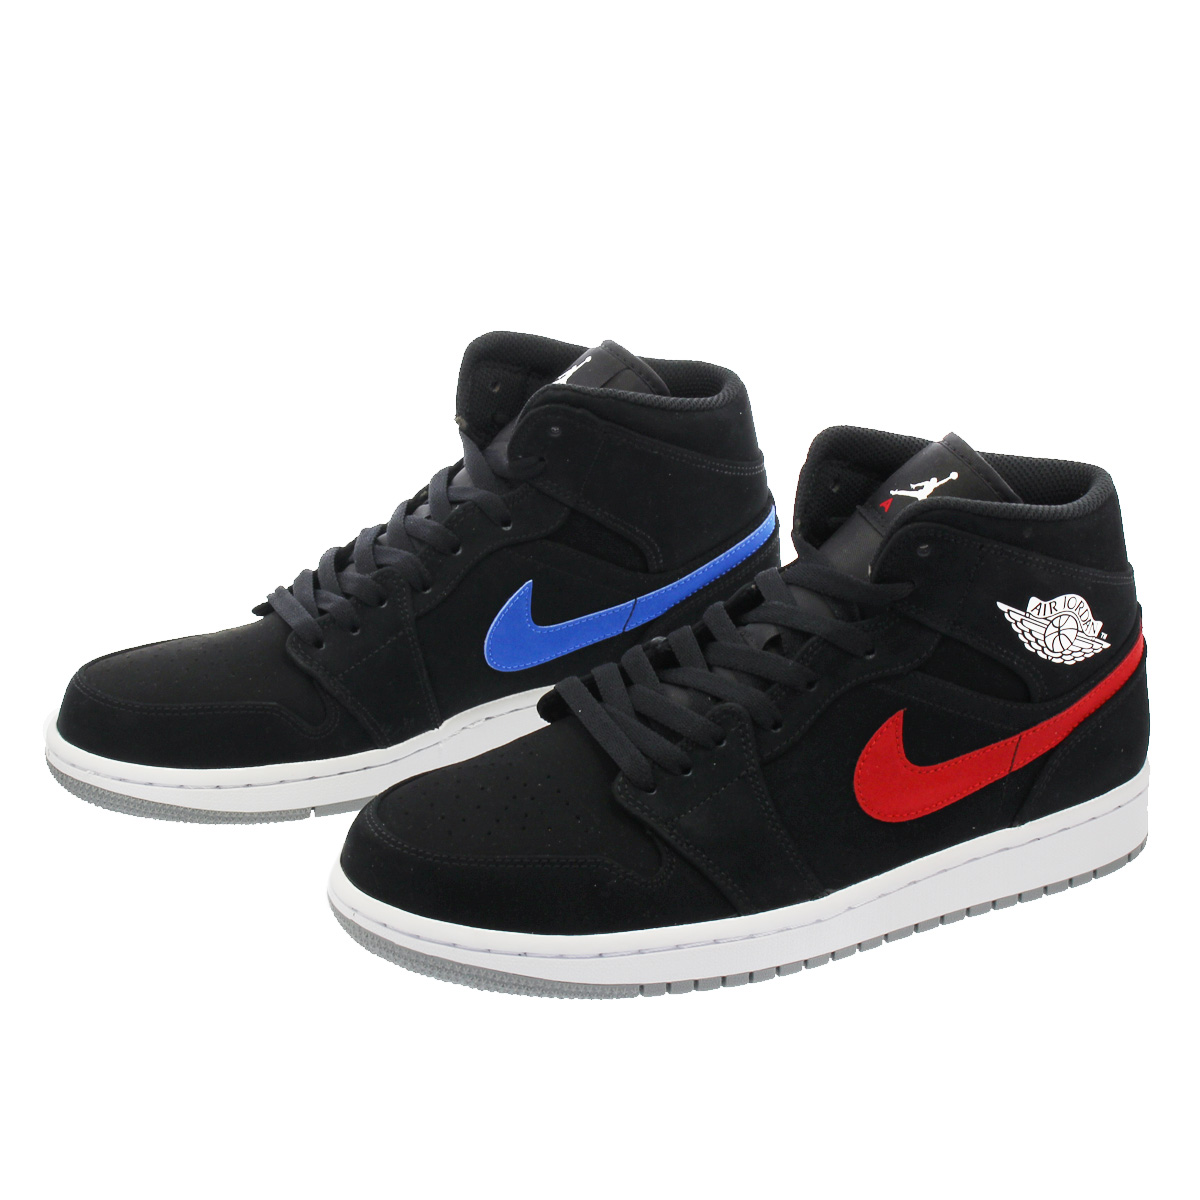 7c321ad2ff4ed NIKE AIR JORDAN 1 MID Nike Air Jordan 1 mid BLACK MULTI COLOR RED BLUE  554